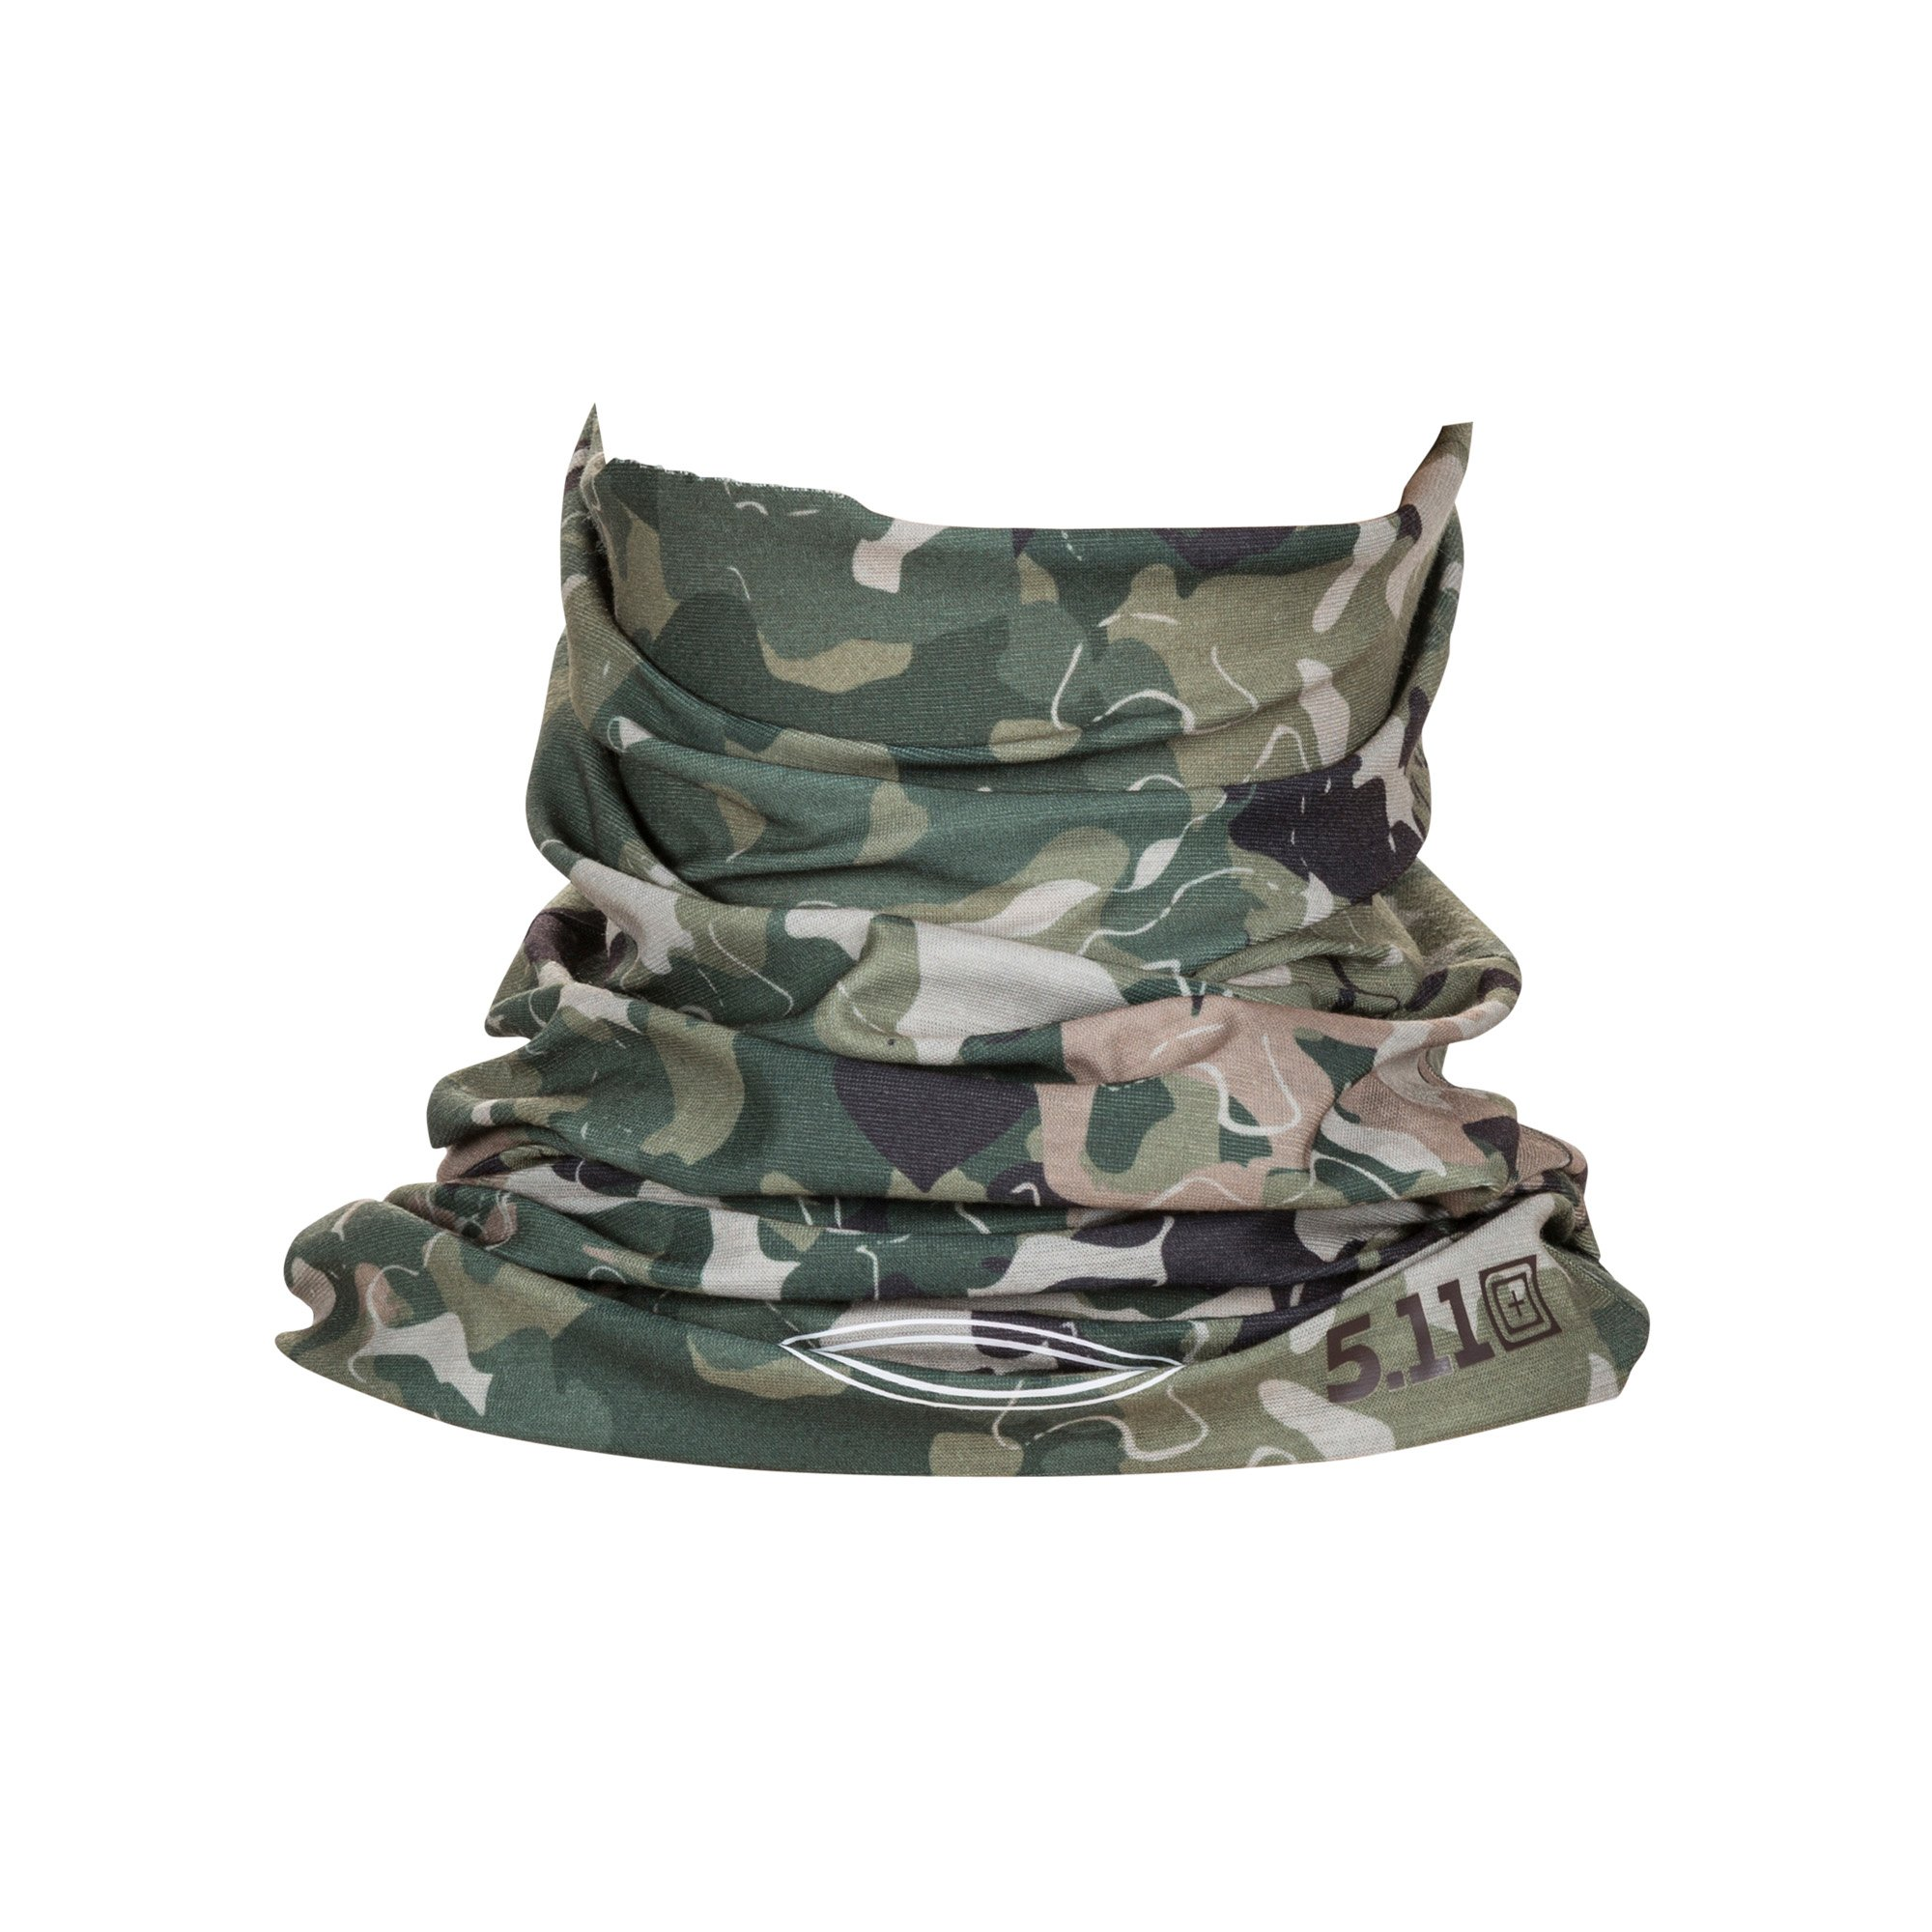 HALO NECK GAITER – Military Green Camo